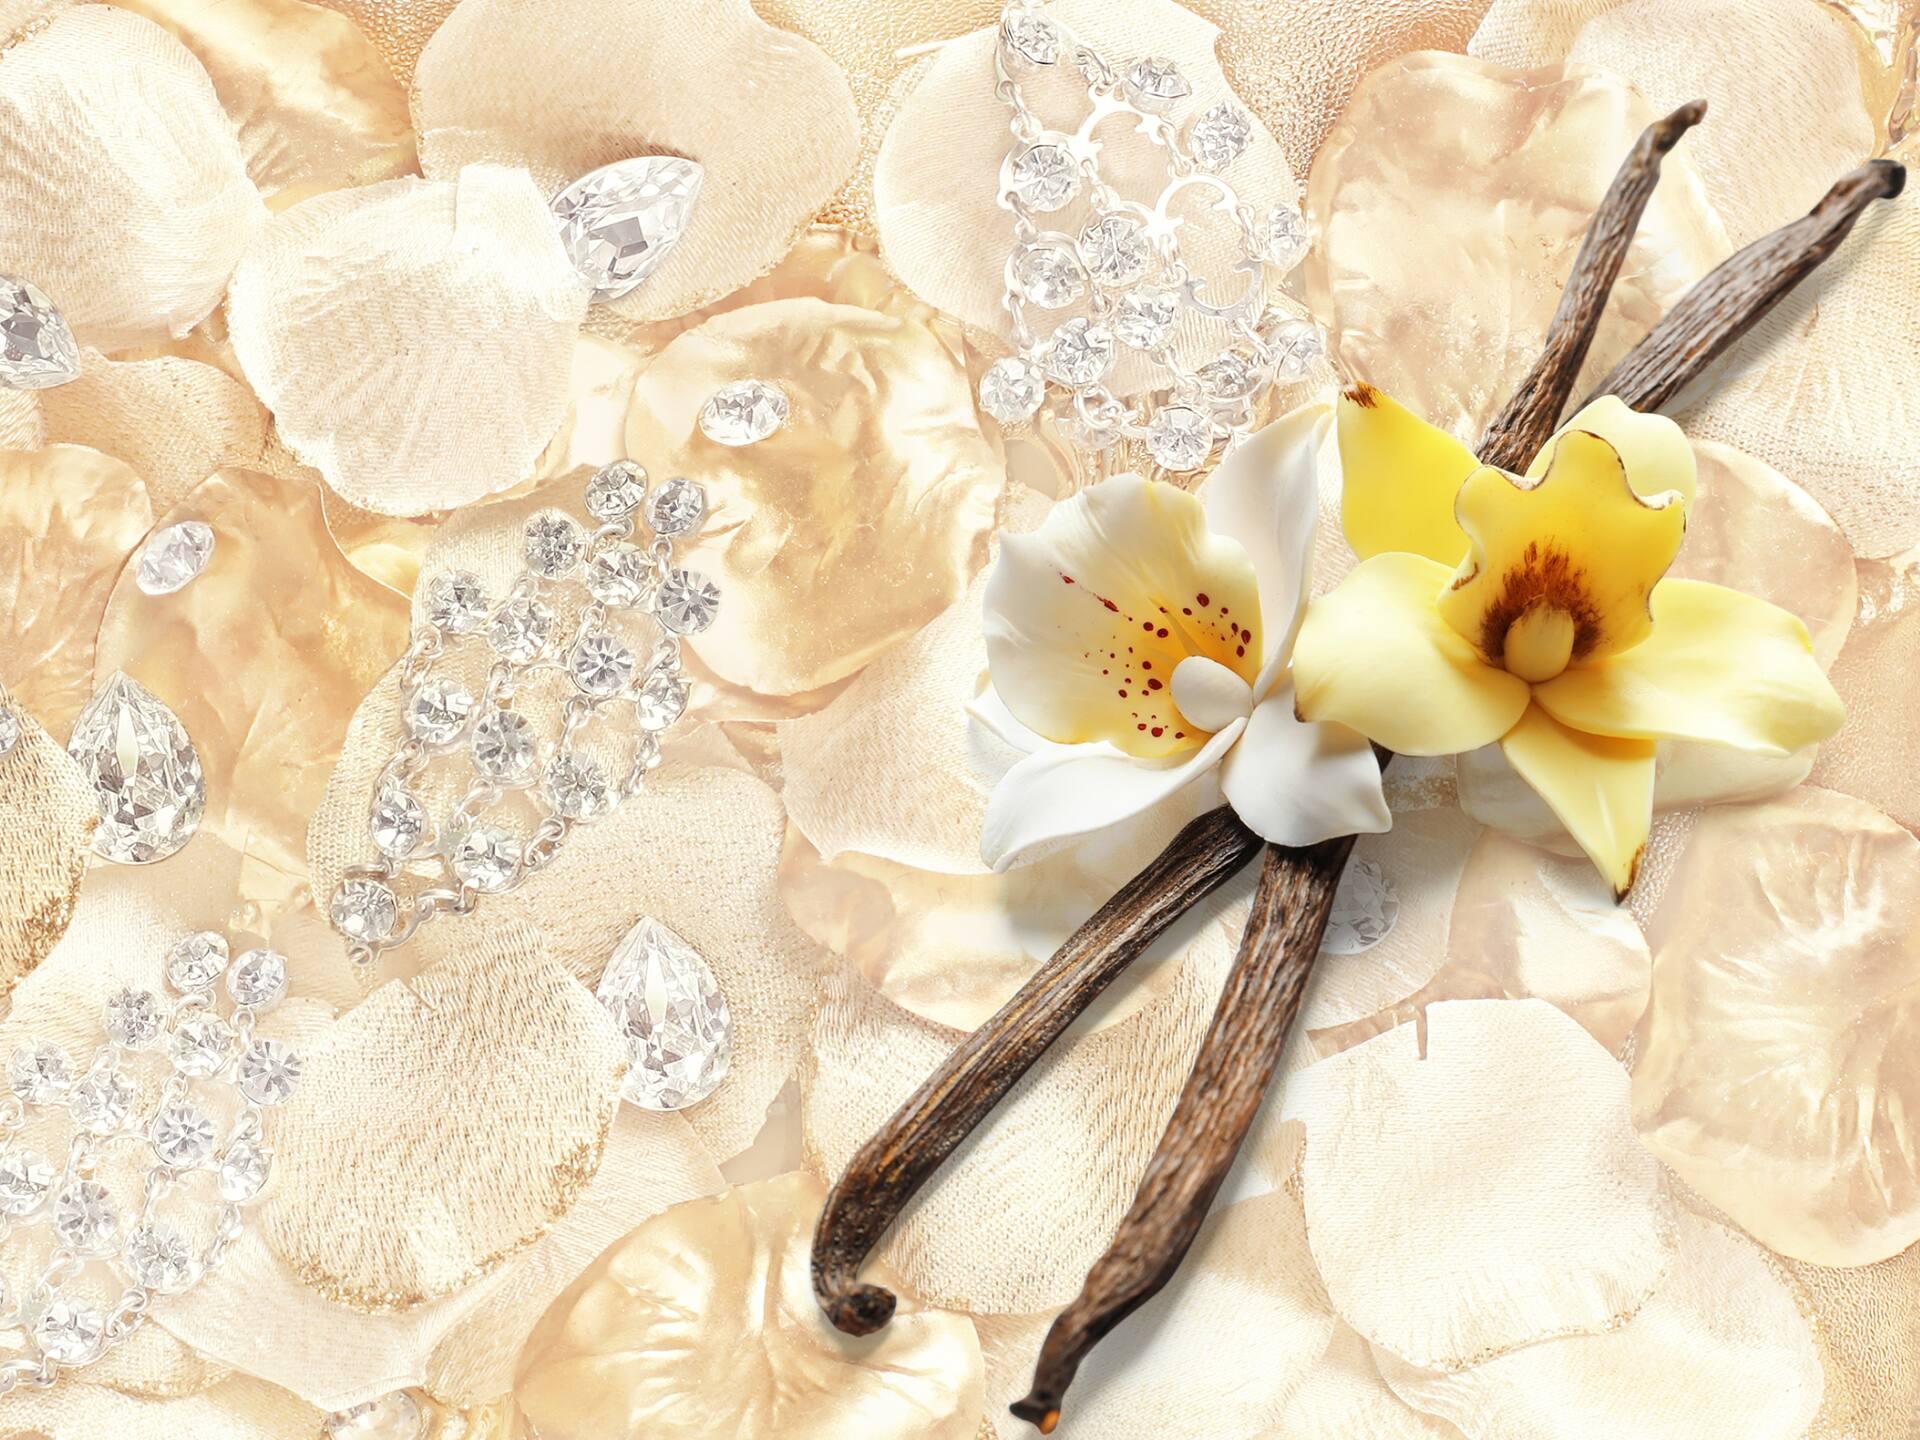 BUBLINO CREAMGEL fleur de vanille, tekuté mýdlo na tělo i ruce, s pumpičkou